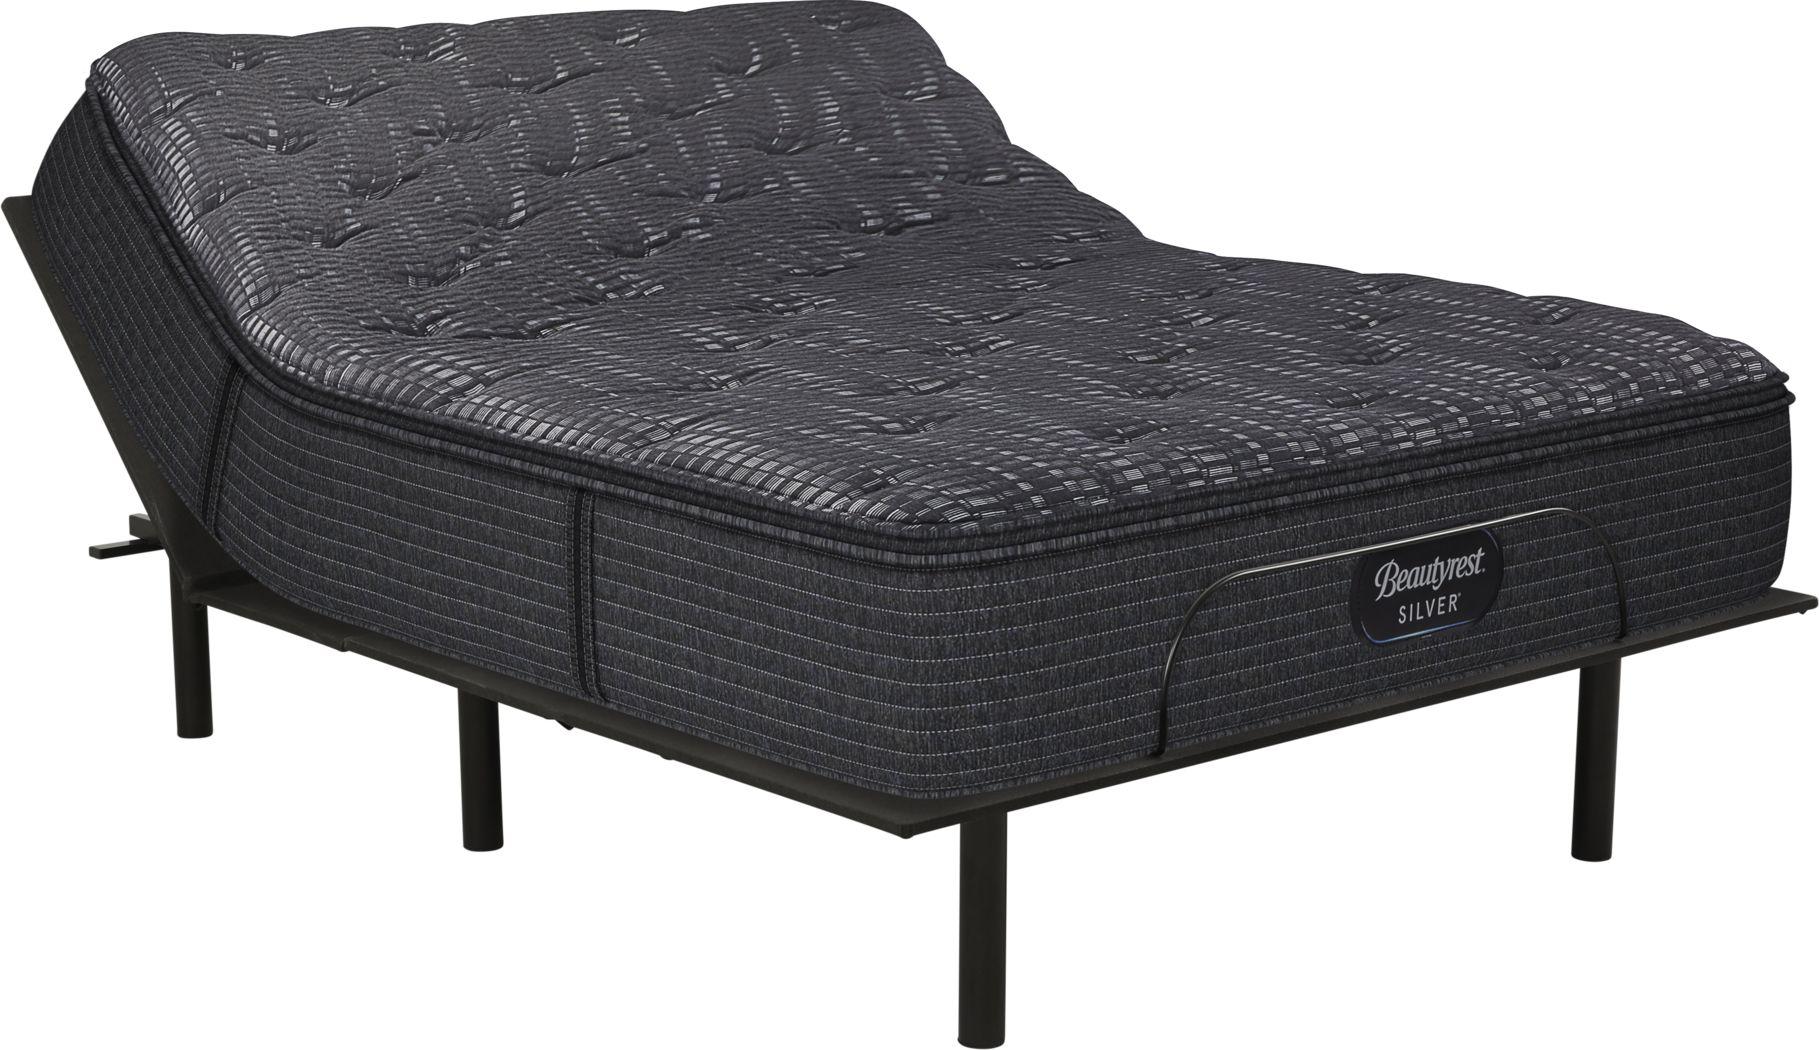 Beautyrest Silver Summerdale King Mattress with RTG Sleep 2000 Adjustable Base